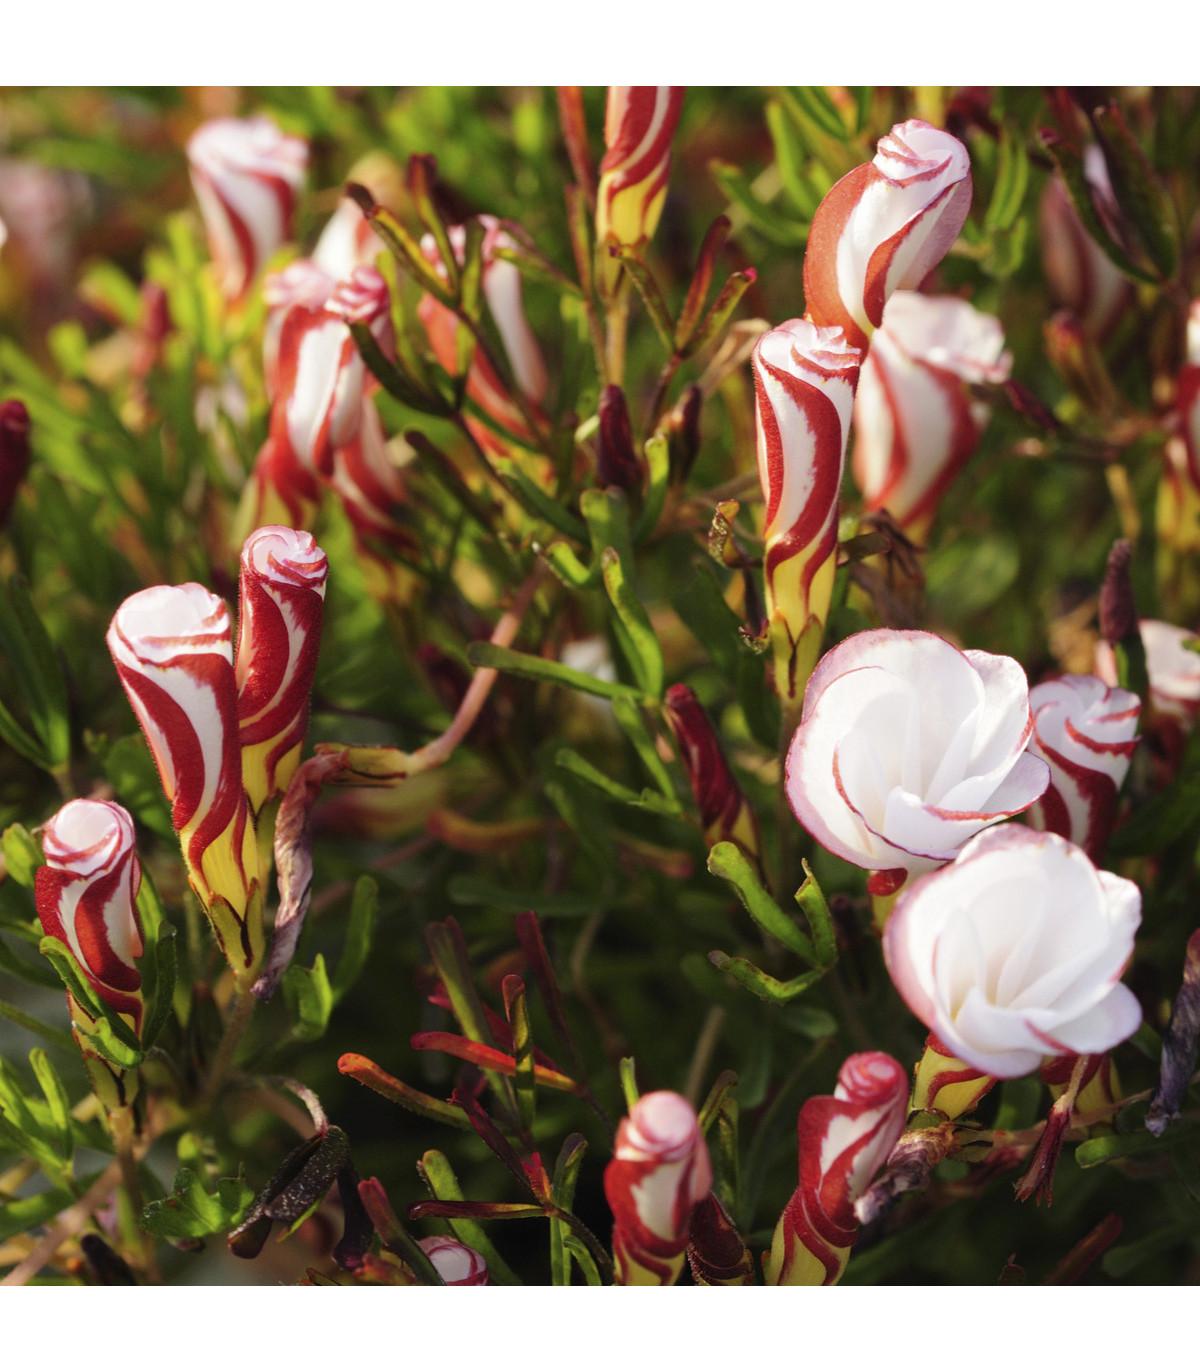 Šťaveľ dvojfarebný - Oxalis versicolor - predaj hľúz - 1 ks